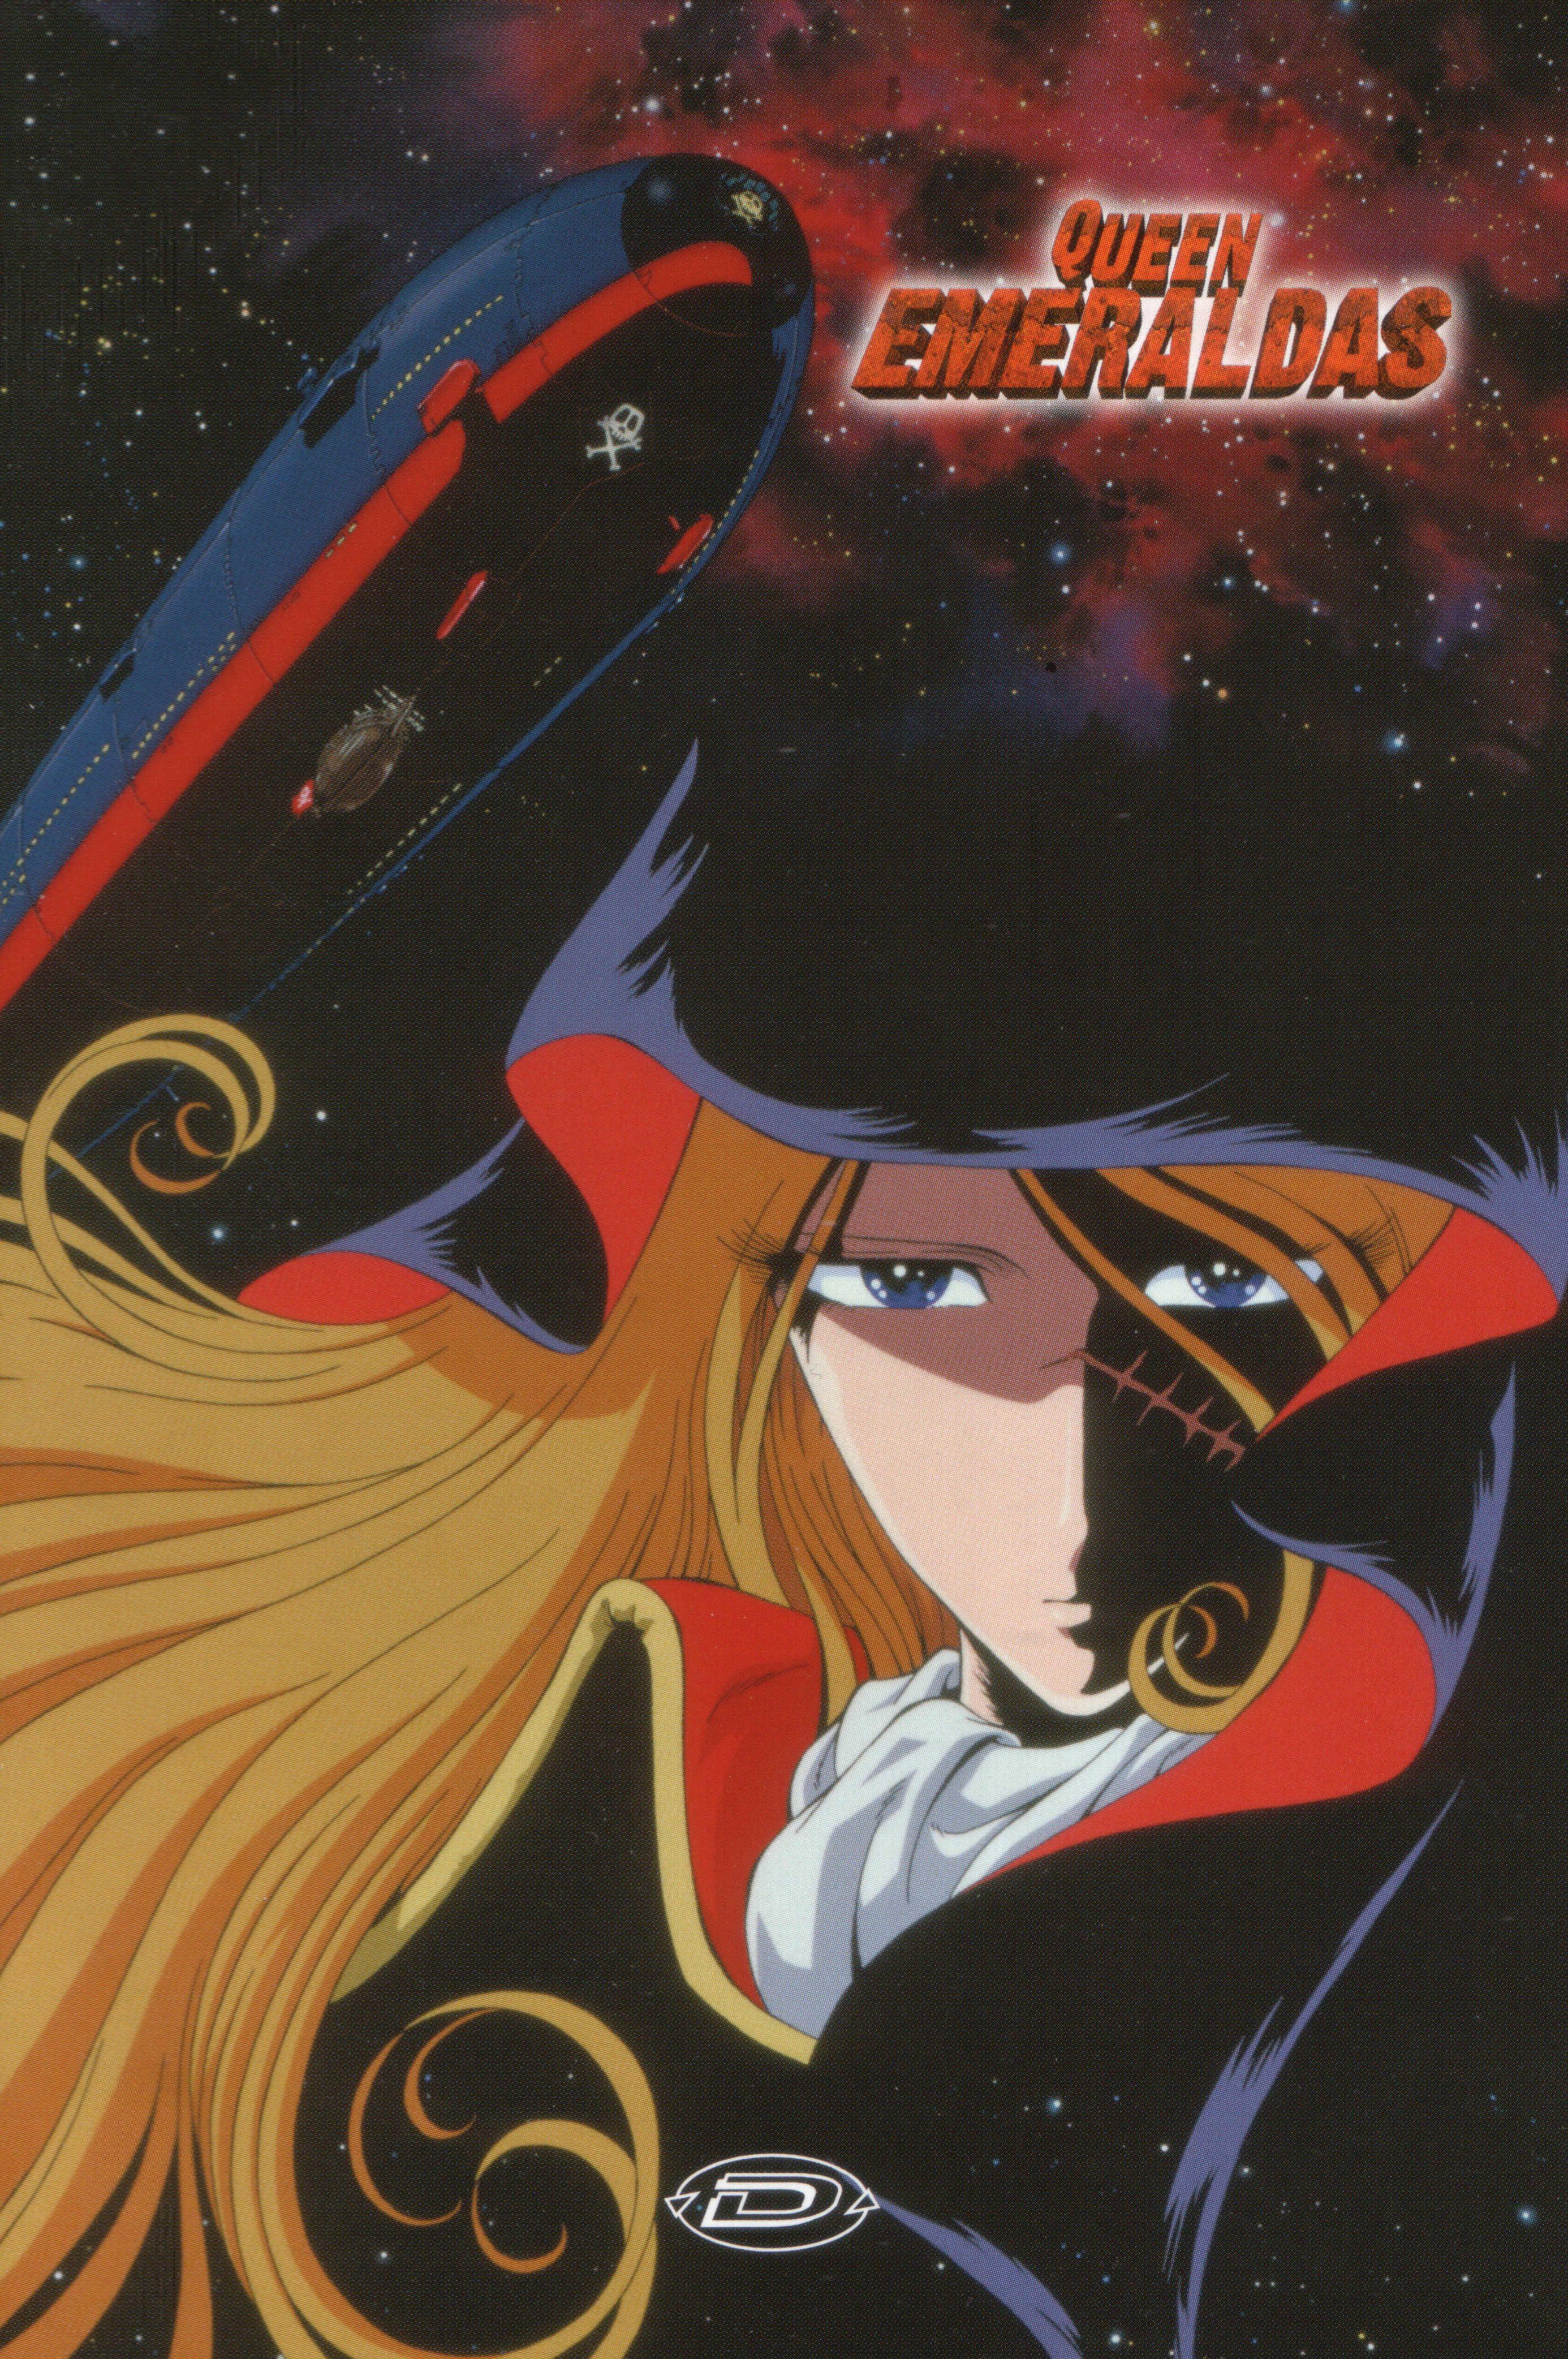 2772x4170 (100) Anime, Queen emeraldas, Captain harlock